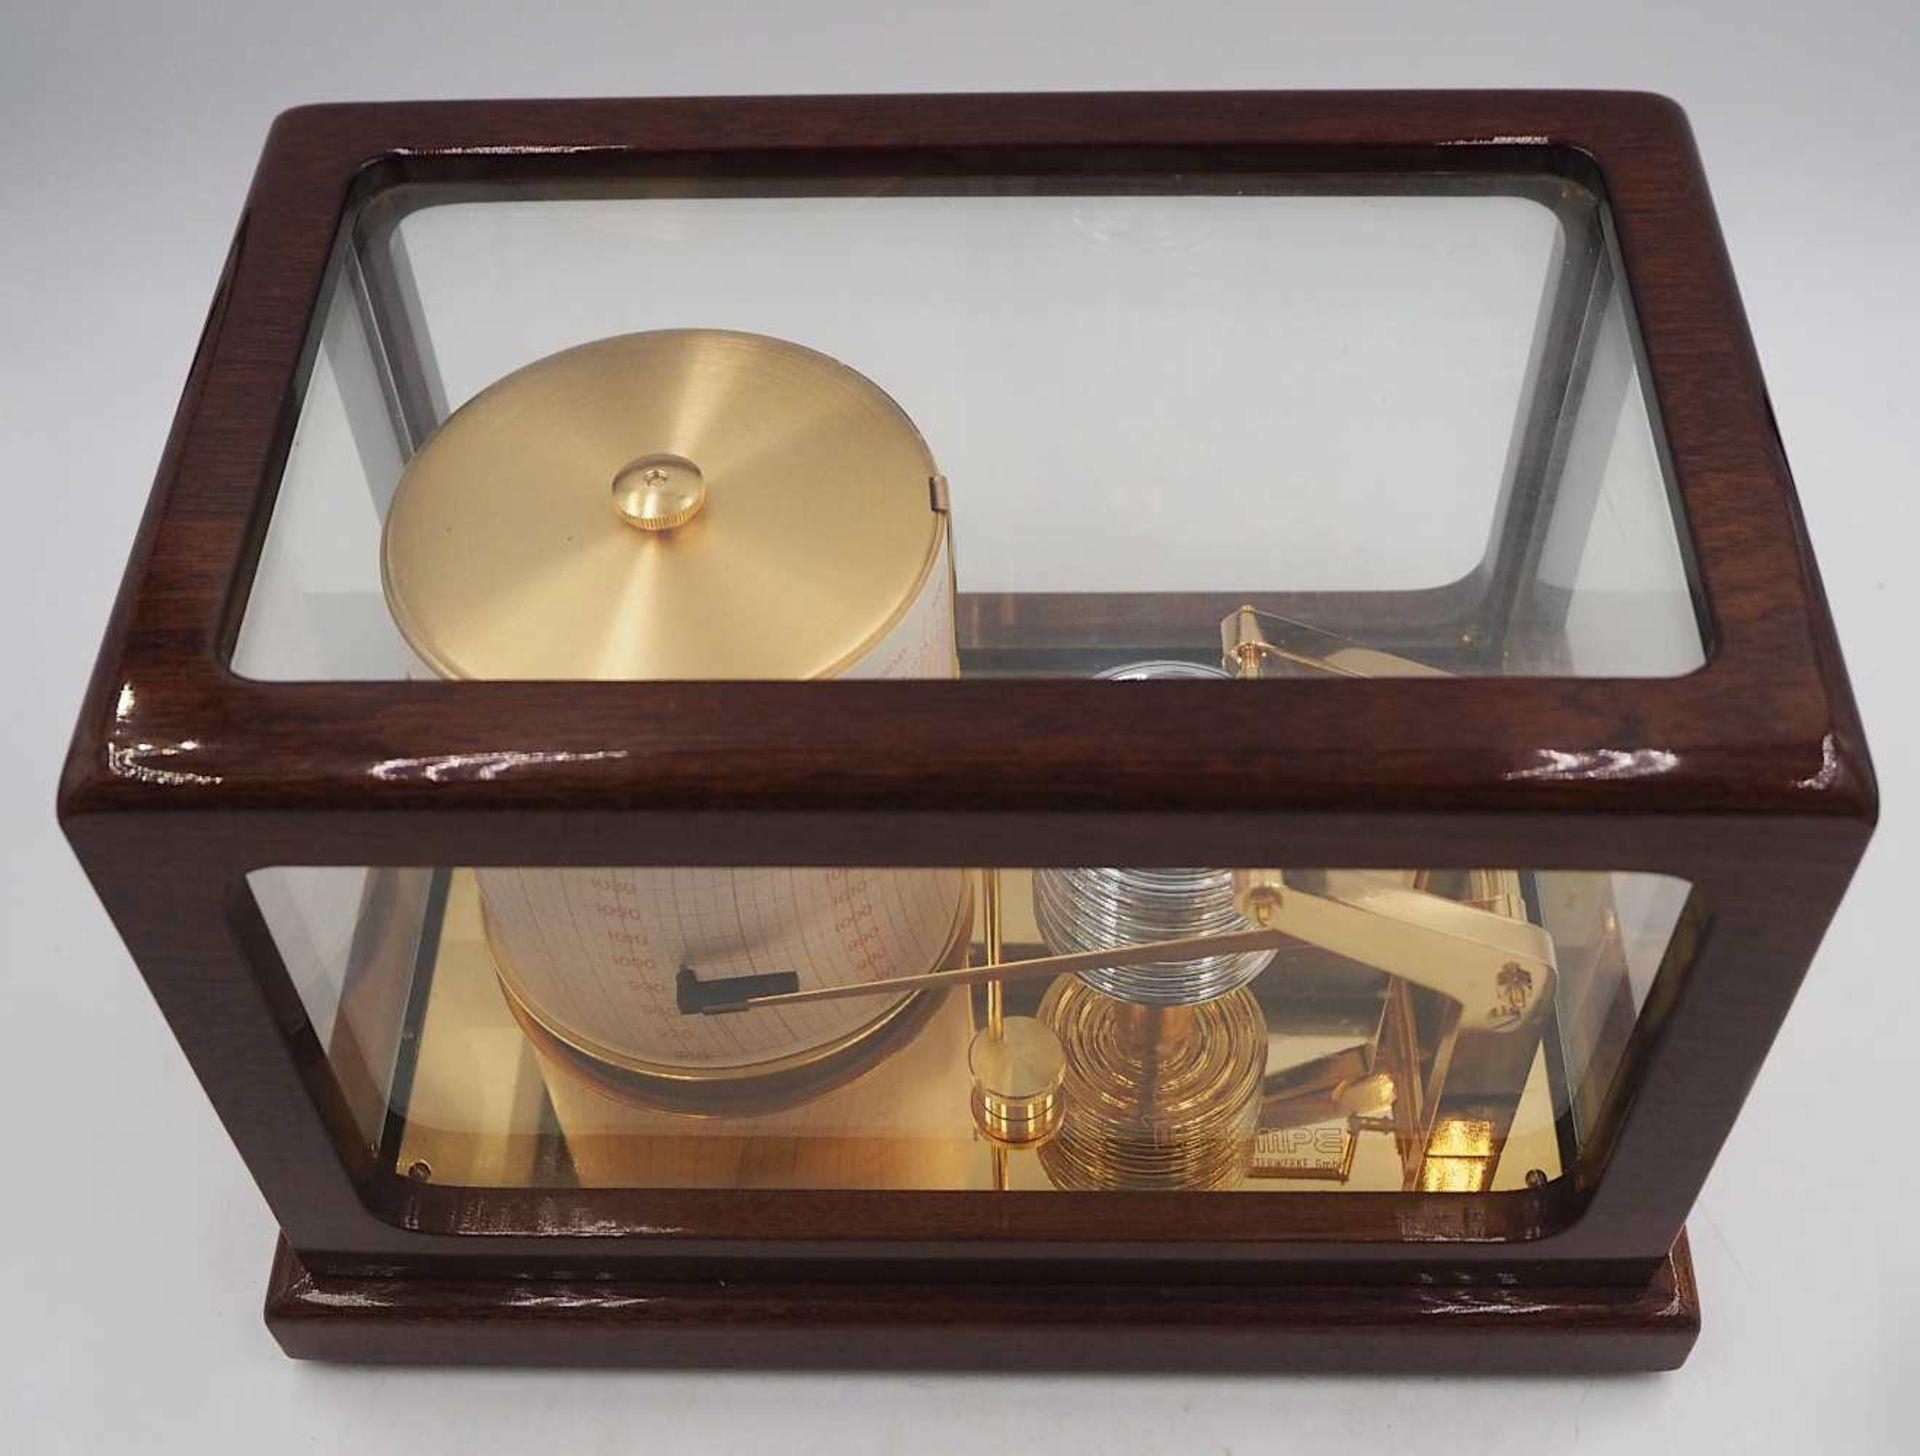 1 Trommelbarograph WEMPE CHRONOMETERWERKE GmbH, 20. Jh. wohl Mahagoni-Gehäuse allseit - Bild 5 aus 6